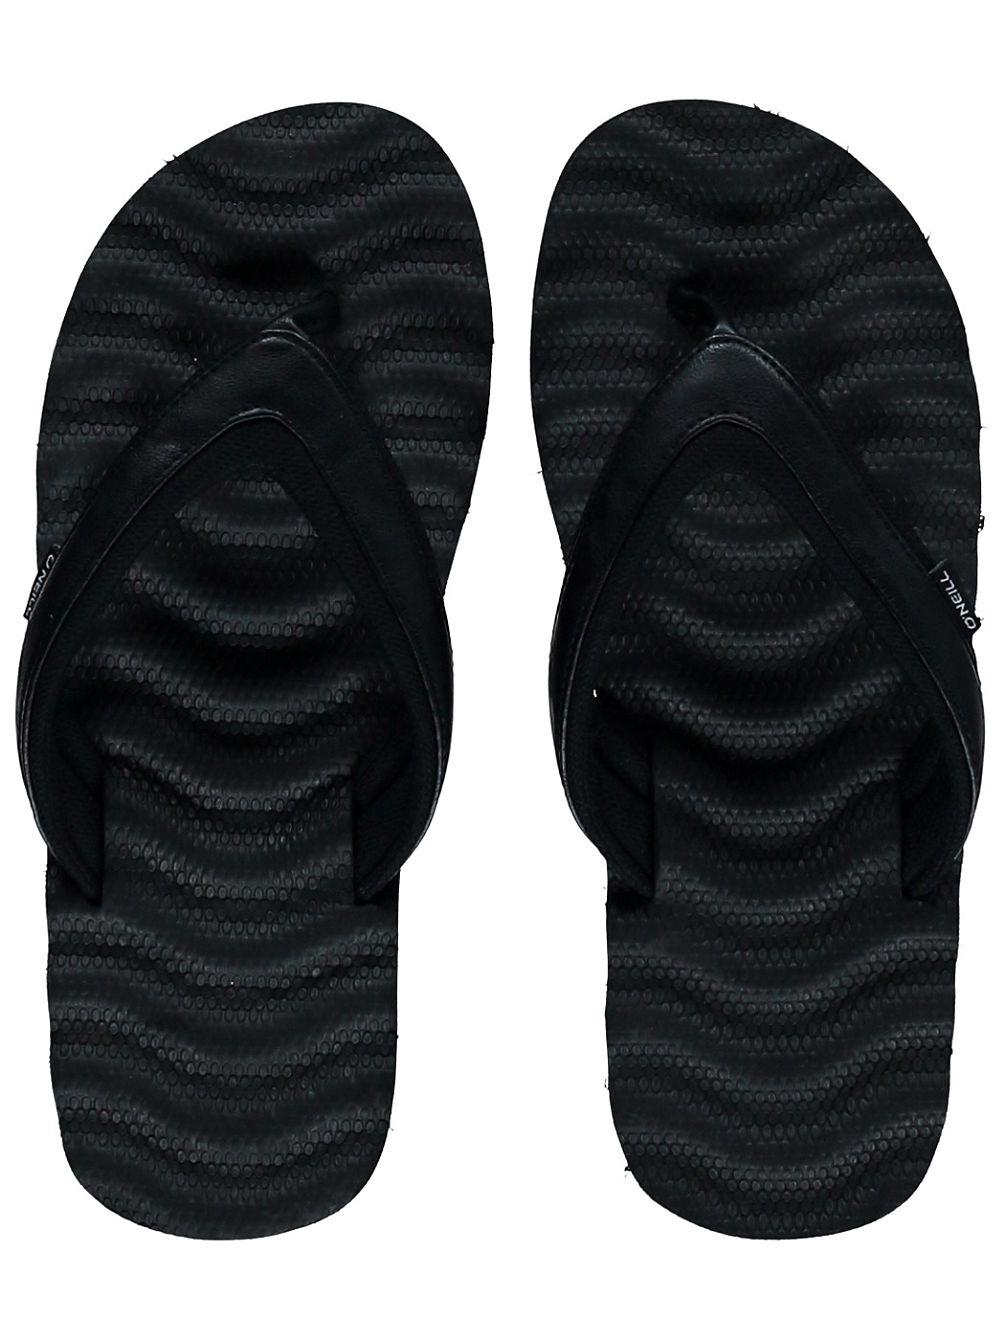 o-neill-koosh-profile-sandals